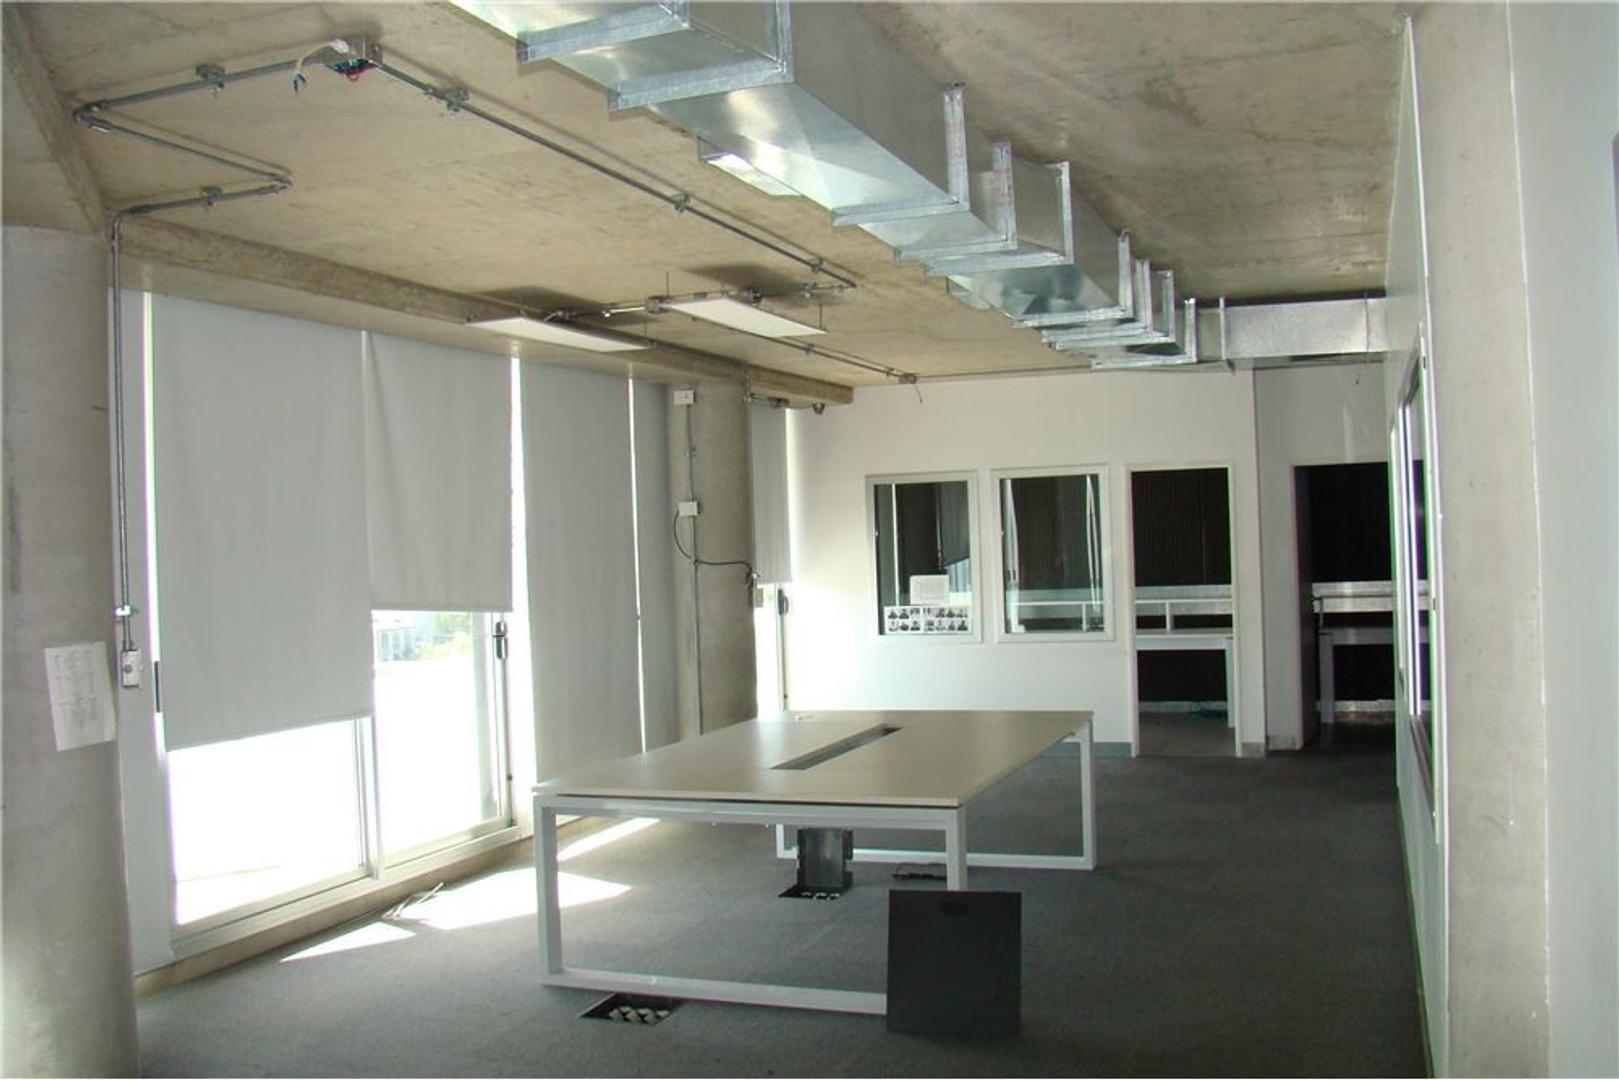 EXCELENTE OFICINA 150 m2 EN DISTRITO AUDIOVISUAL